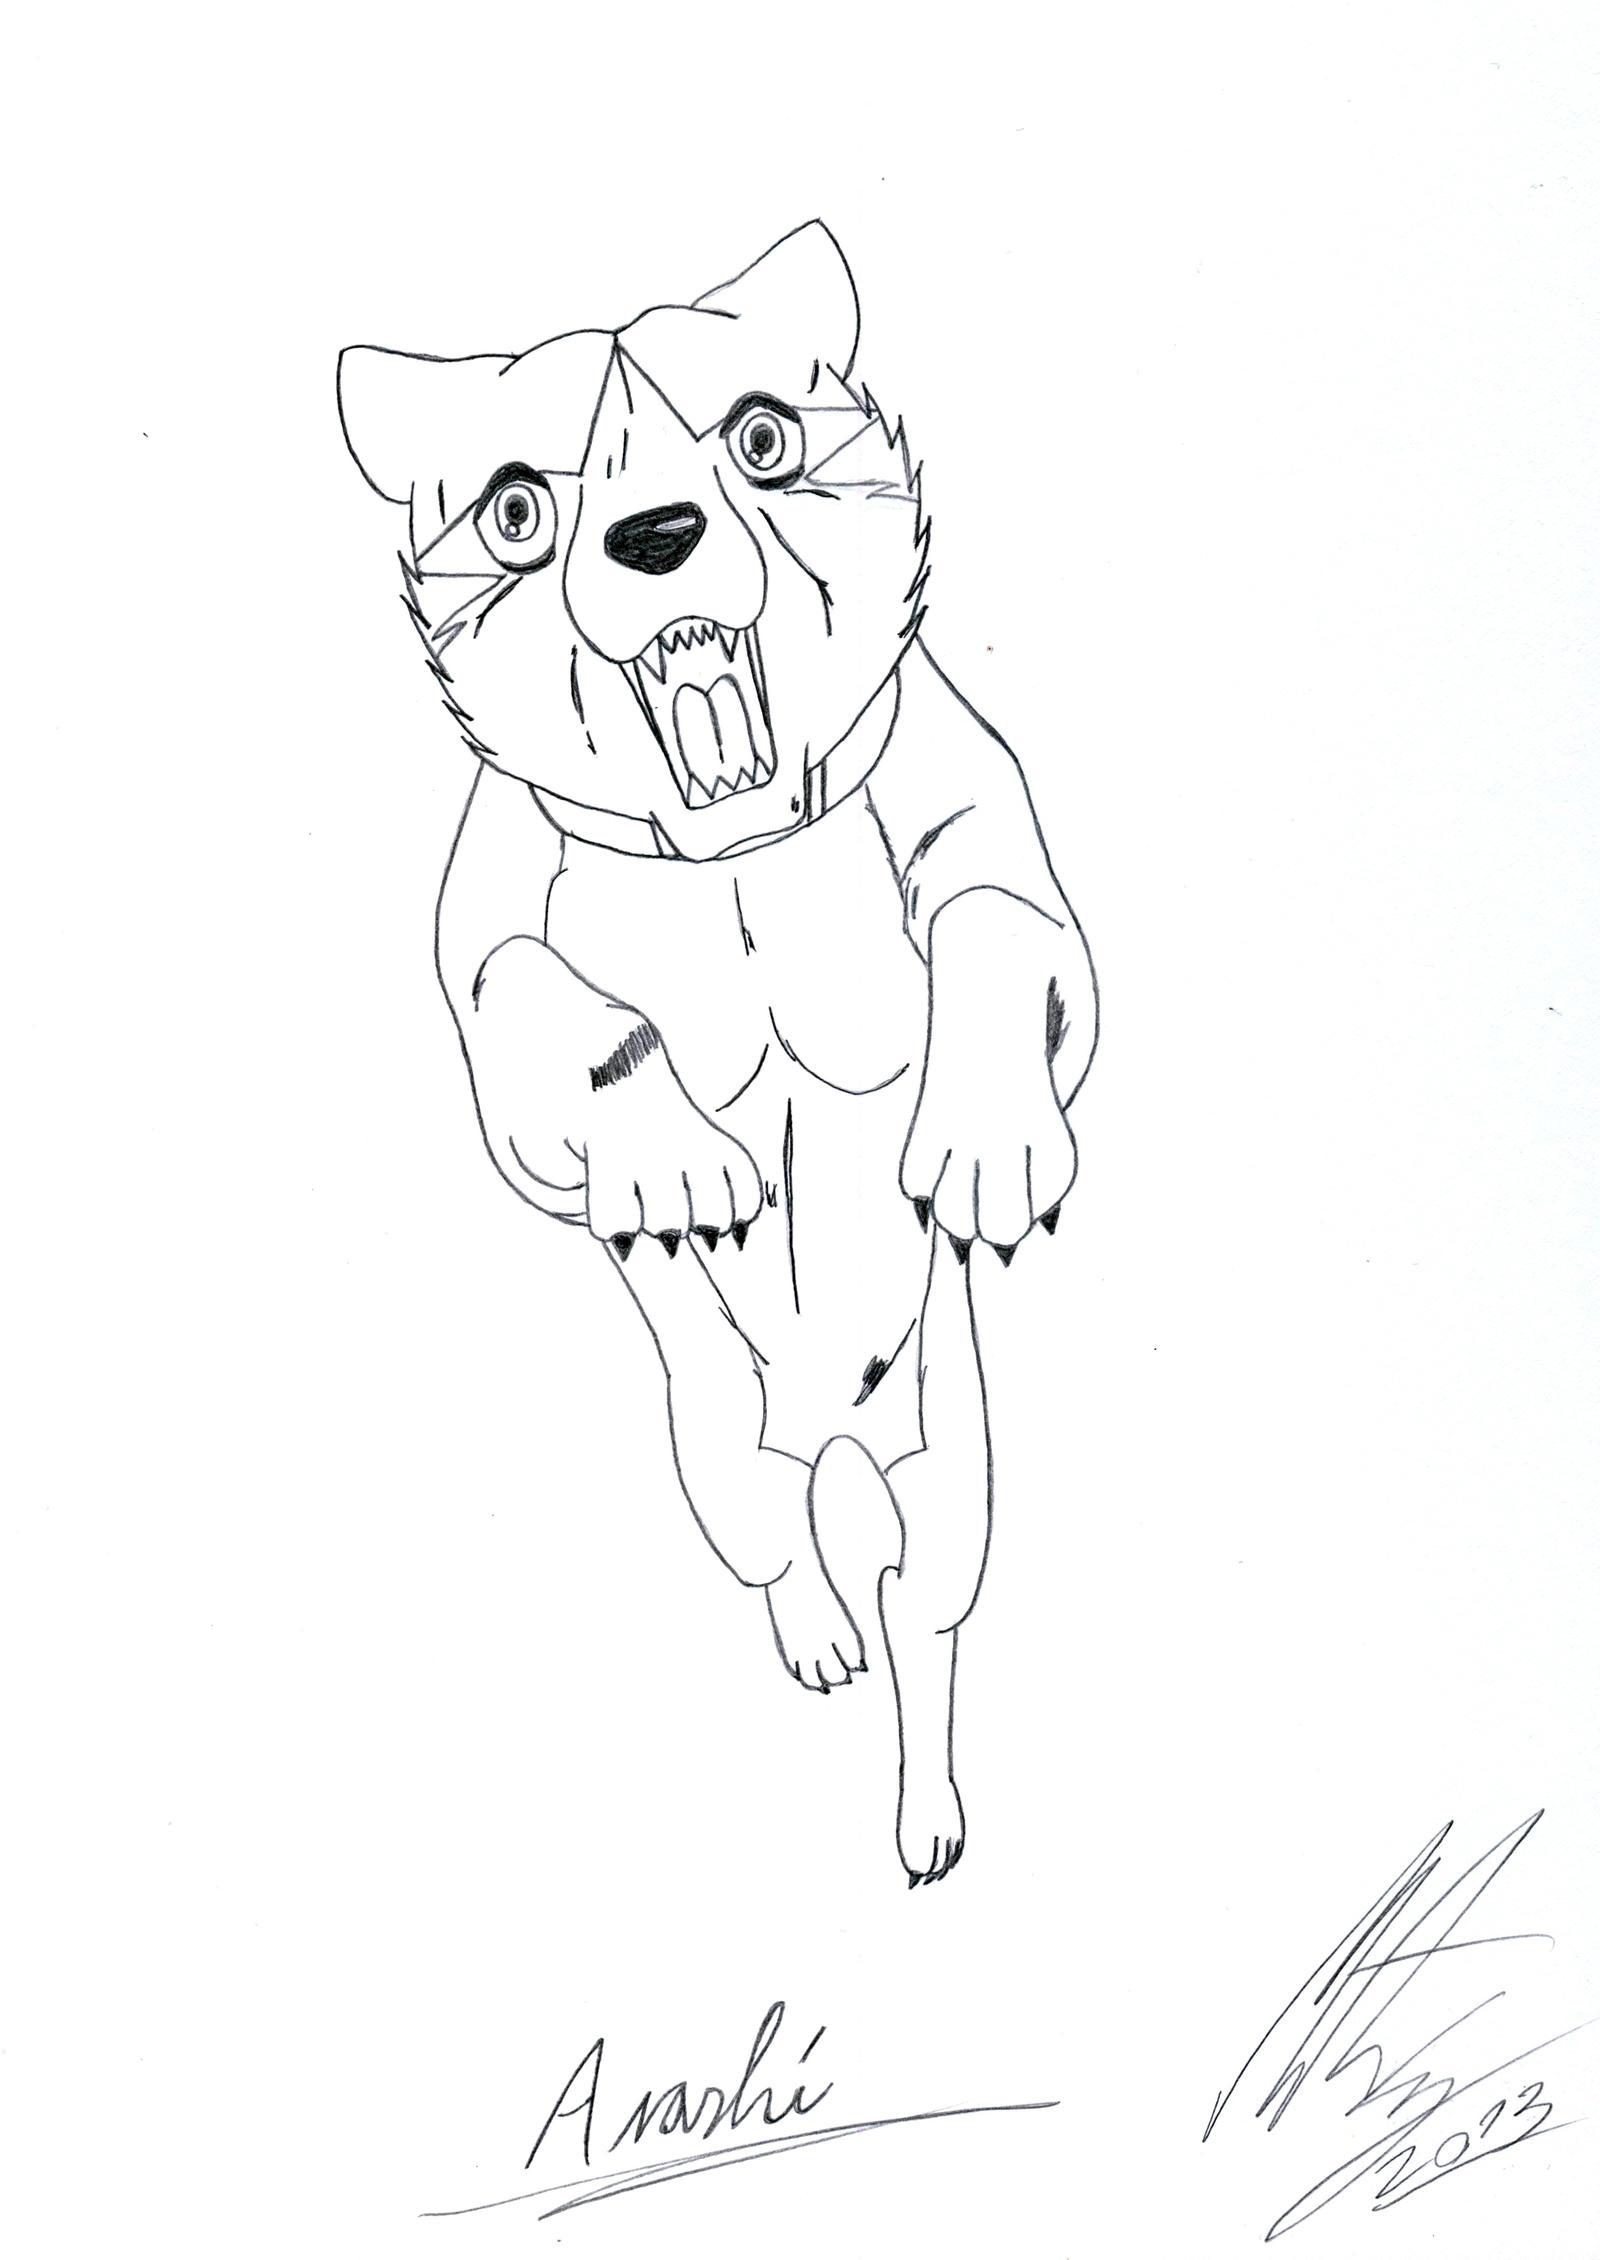 My Ginga OC - Arashi by MortenEng21